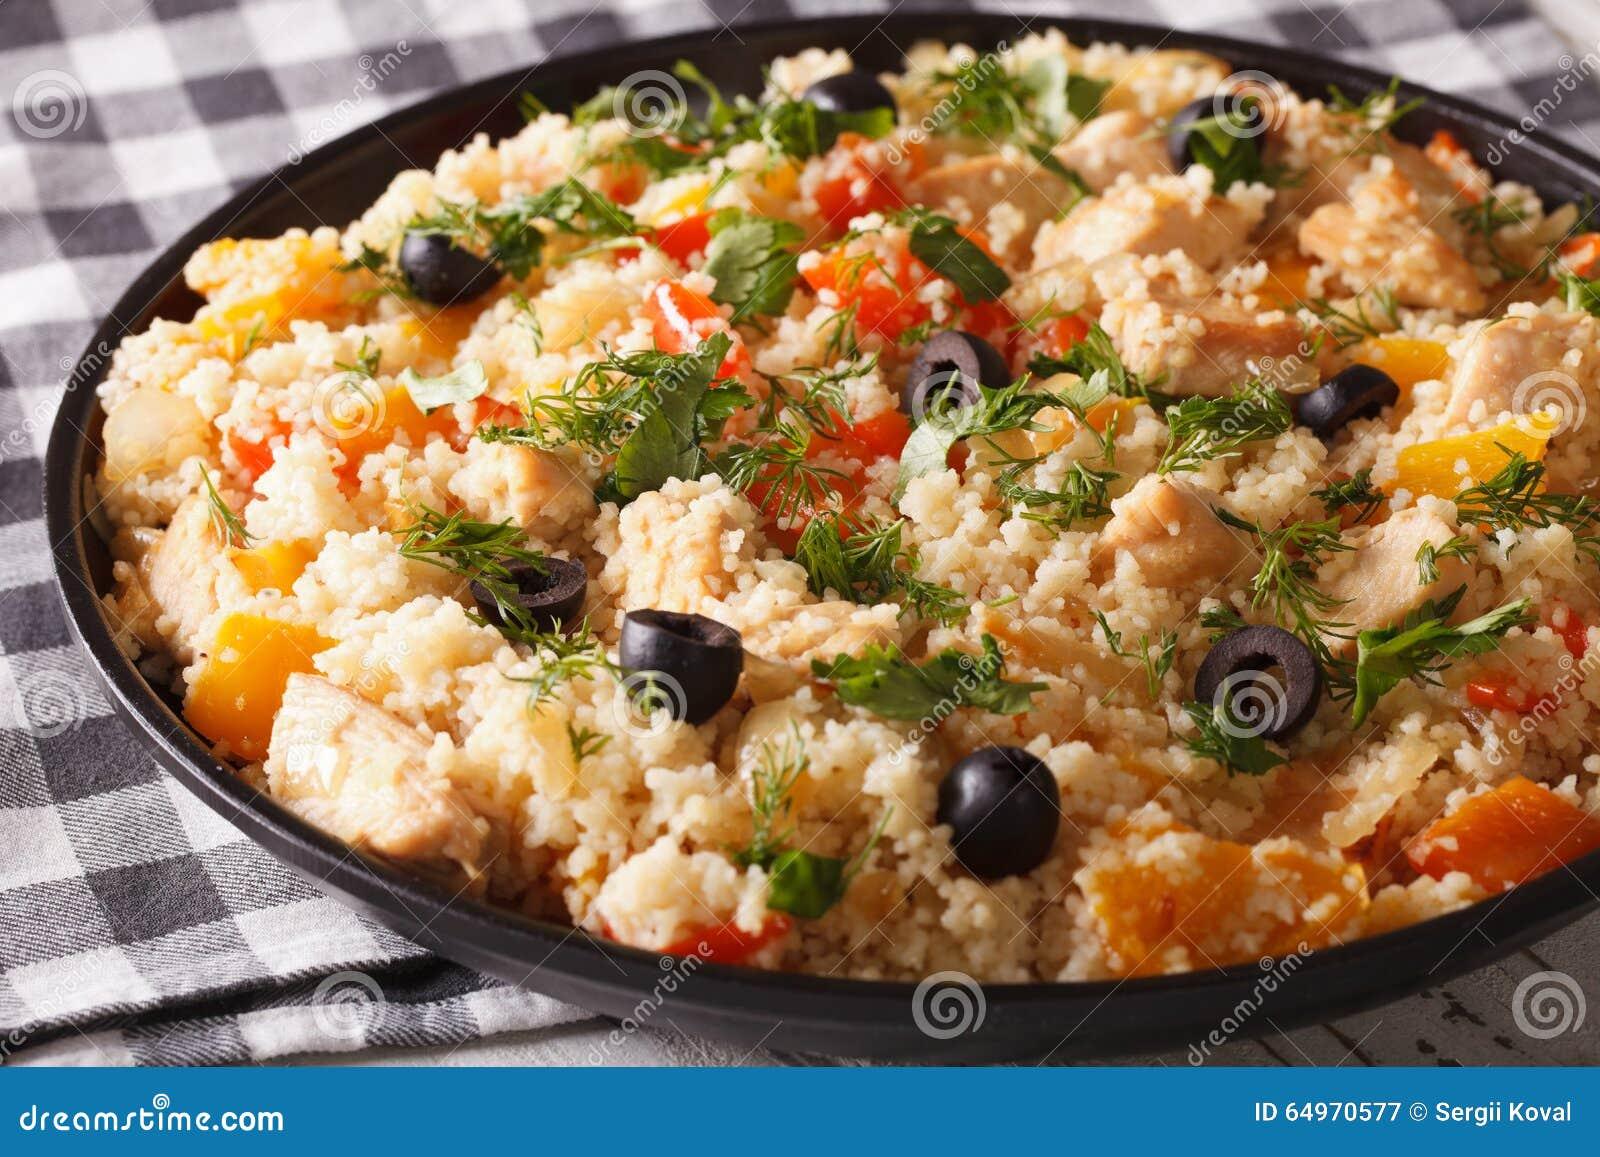 Салат из кускуса с овощами рецепт пошагово